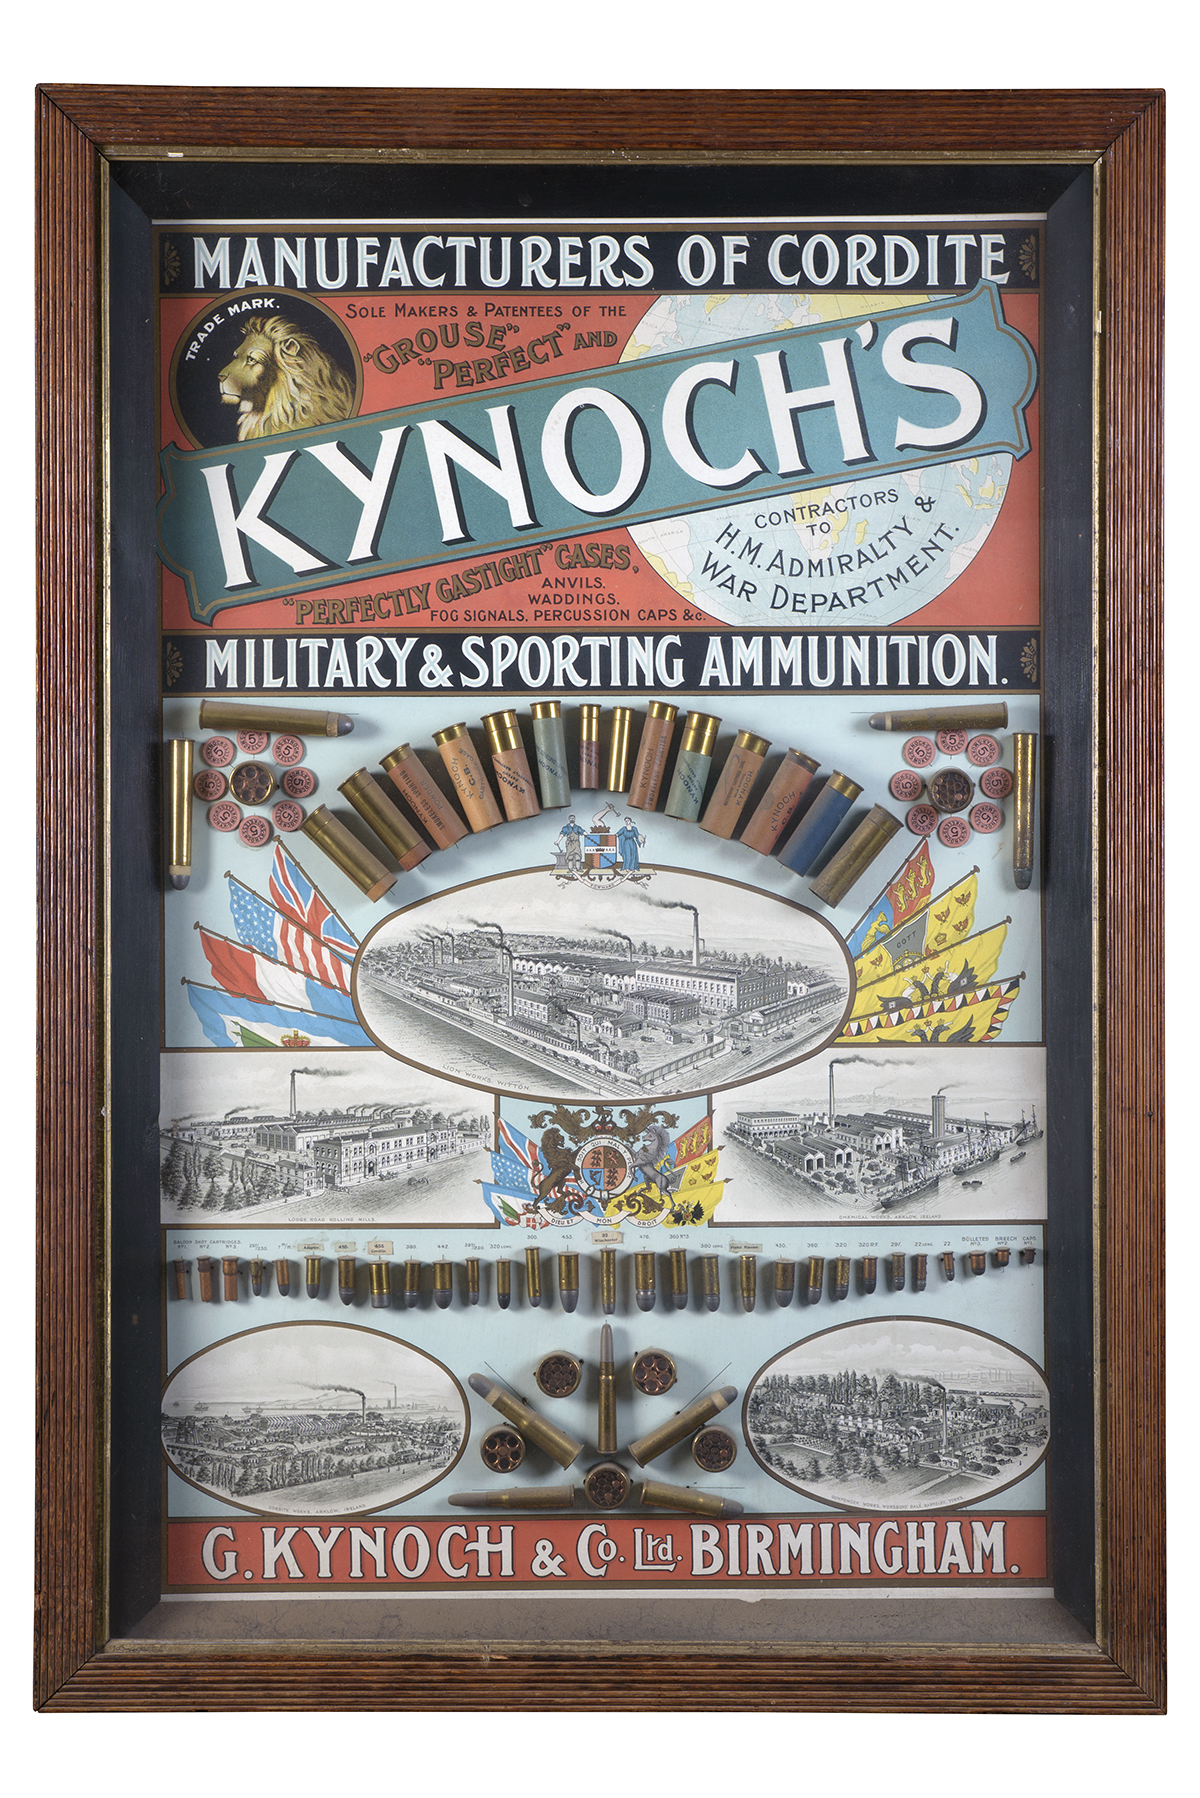 G. KYNOCH & CO., BIRMINGHAM A RARE EARLY GLAZED CARTRIDGE AND METALLIC AMMUNITION ADVERTISING BOARD,